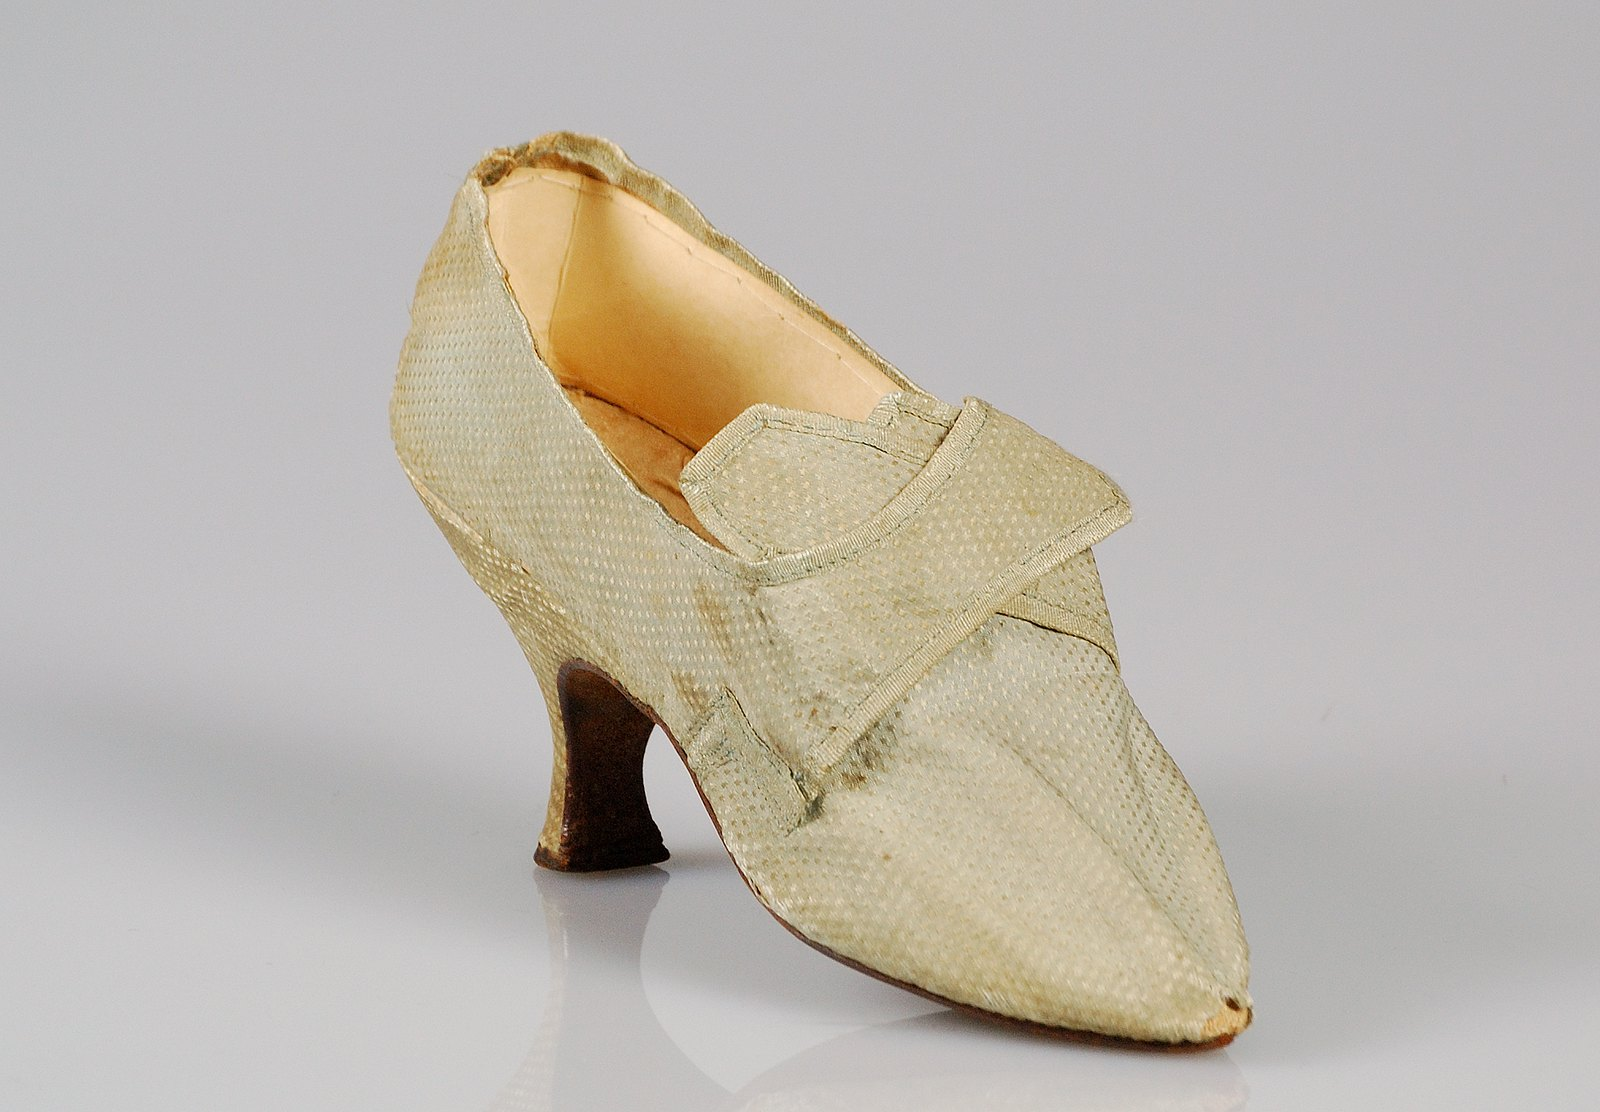 1795. American. Silk